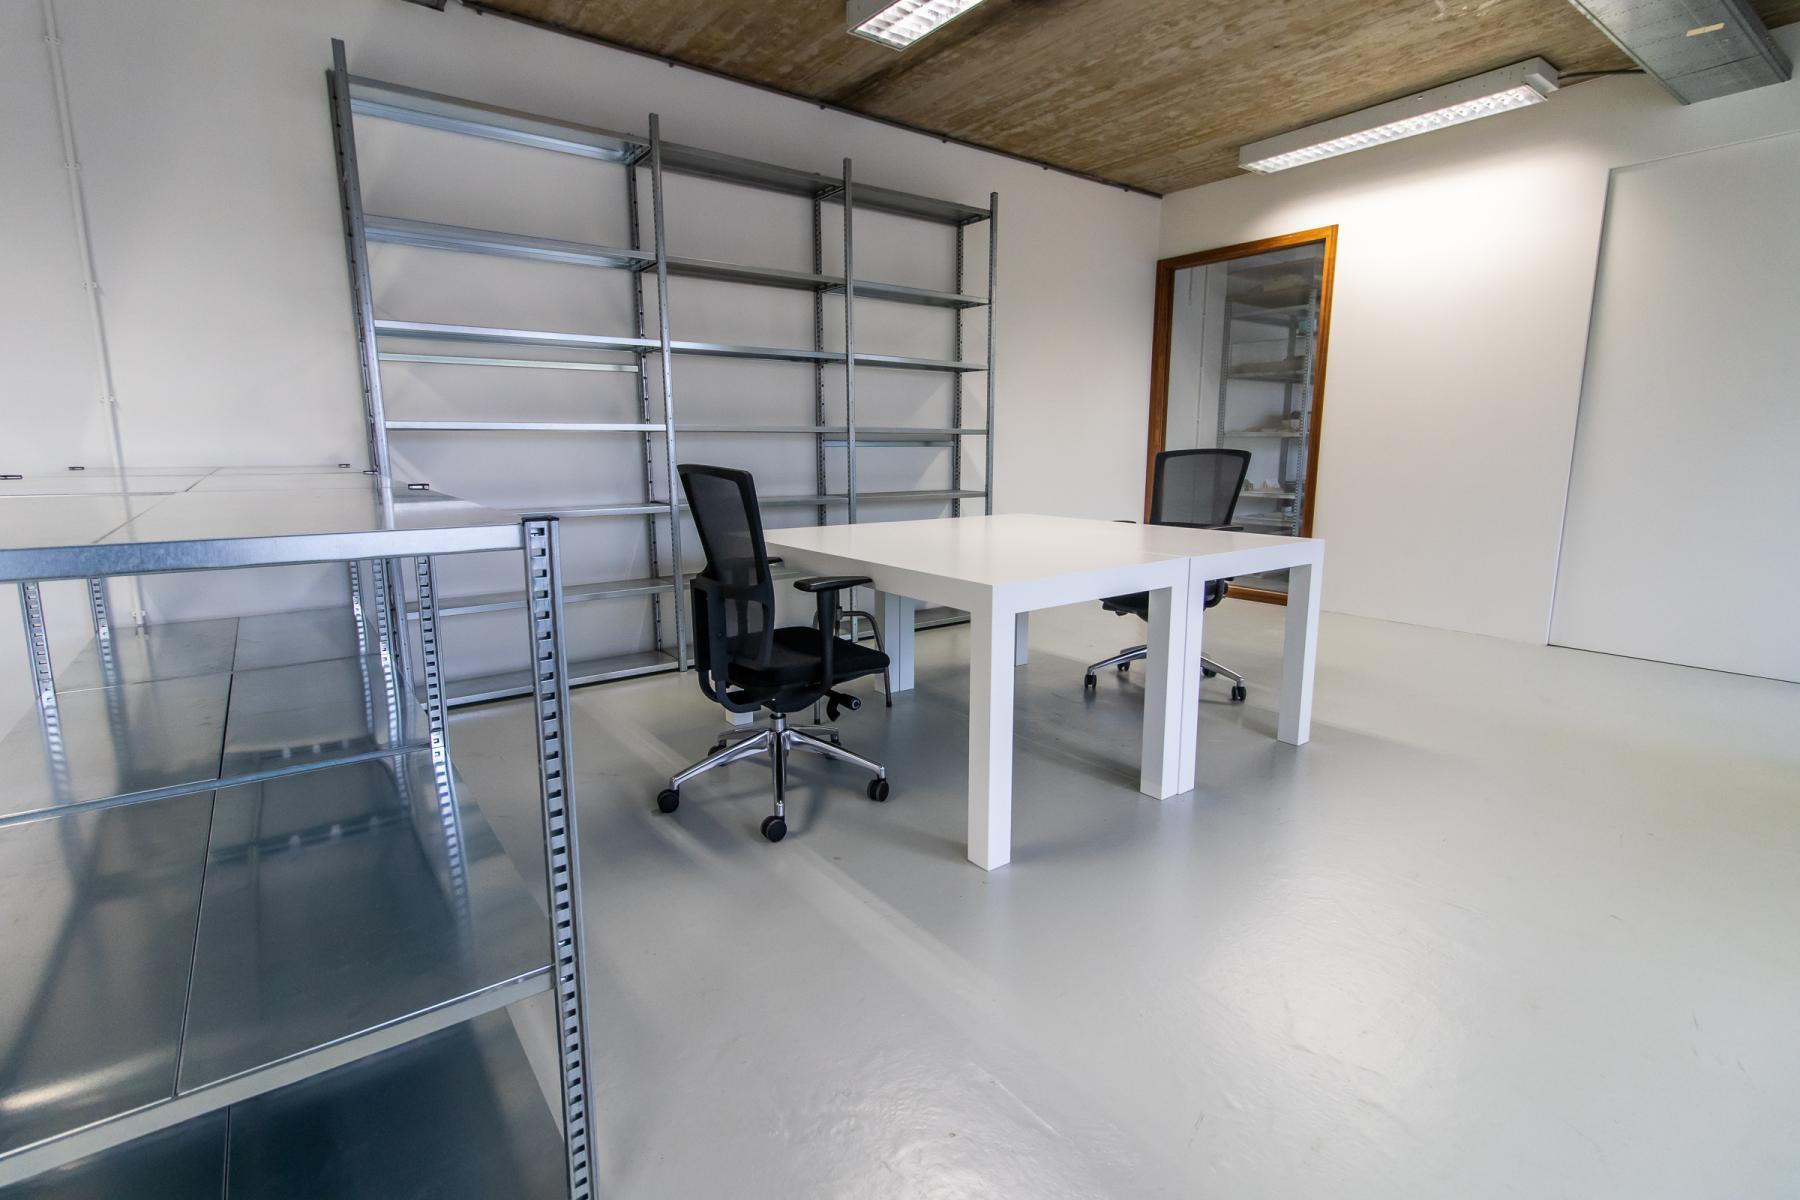 Rent office space Nieuwpoortkade 2a, Amsterdam (12)